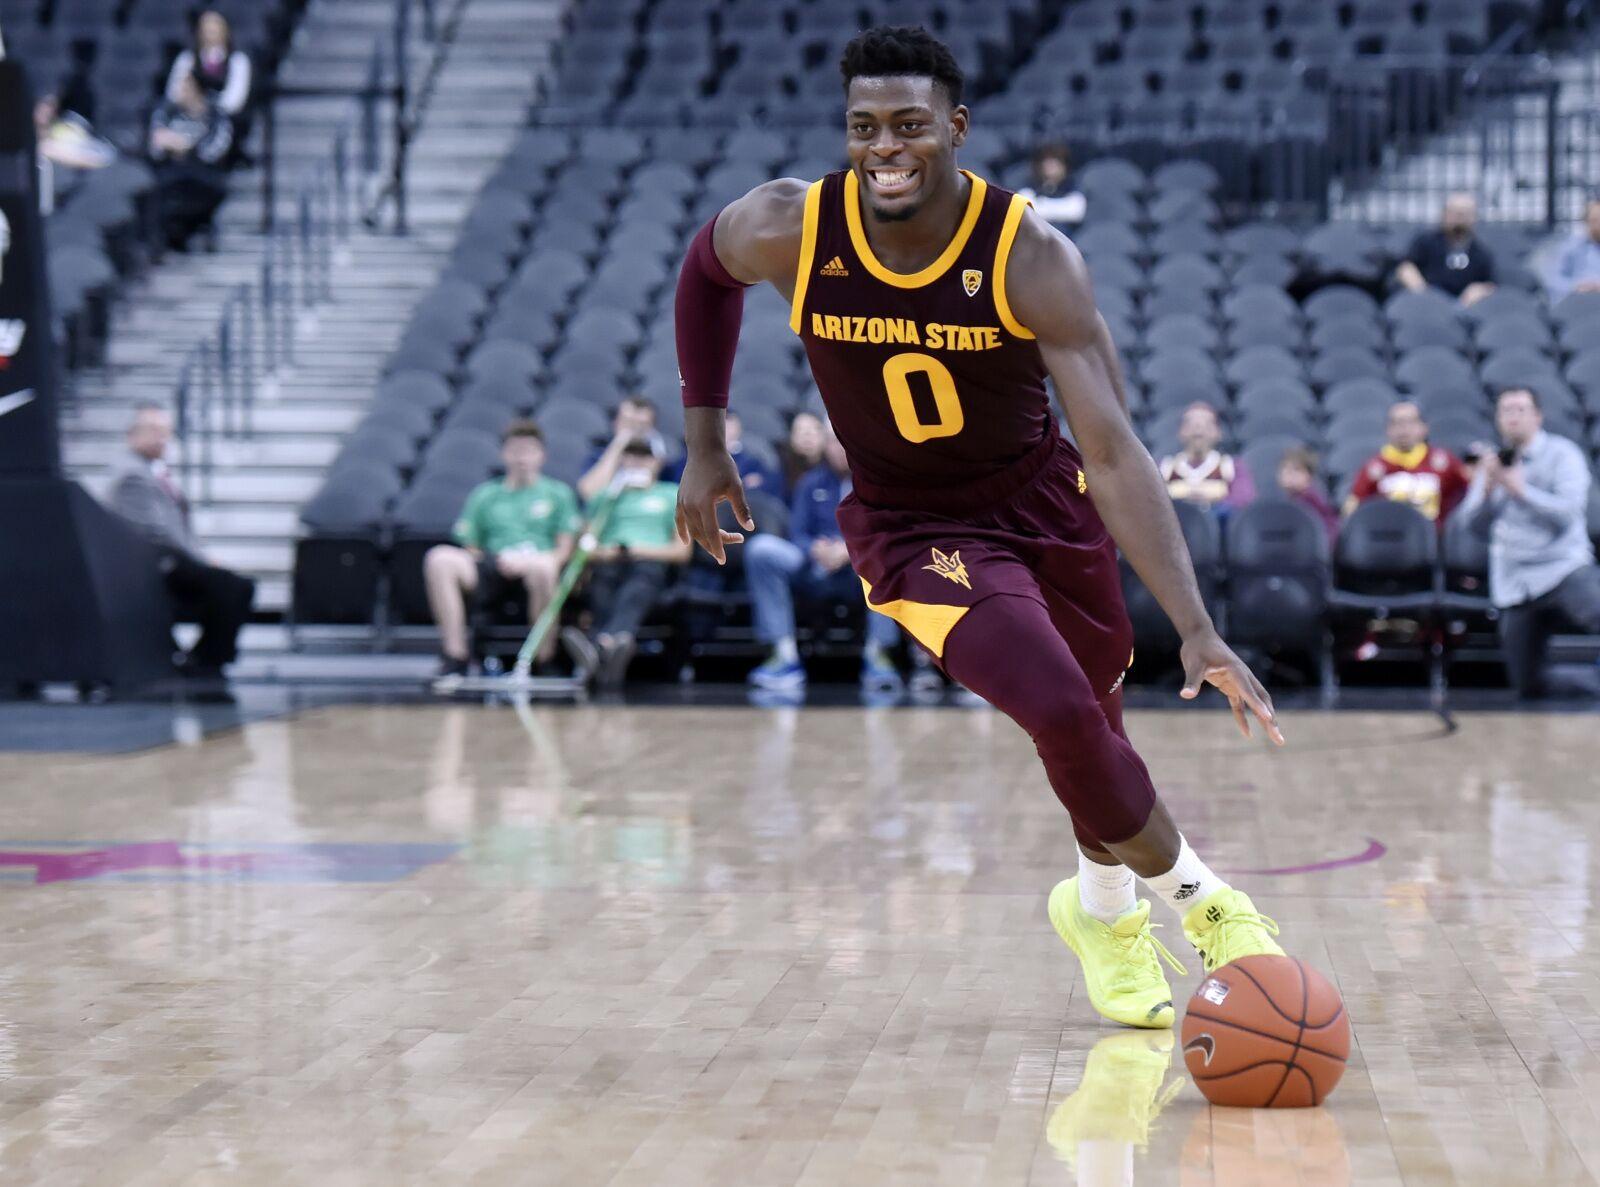 Vanderbilt vs. Arizona State: 2018-19 college basketball game preview, TV schedule